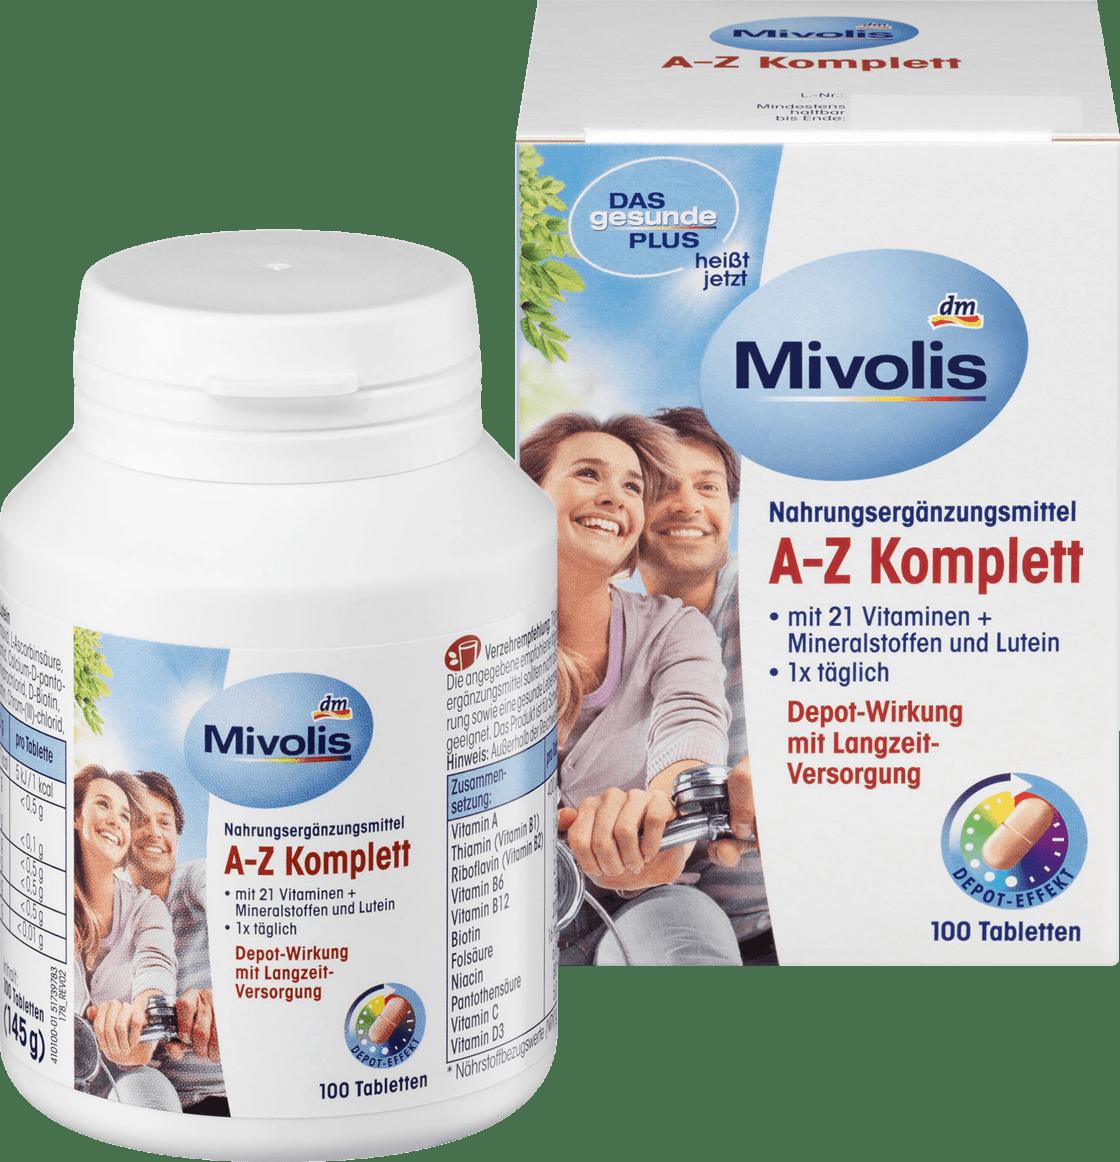 Биологически активная добавка Mivolis A-Z Komplett, 100 шт.